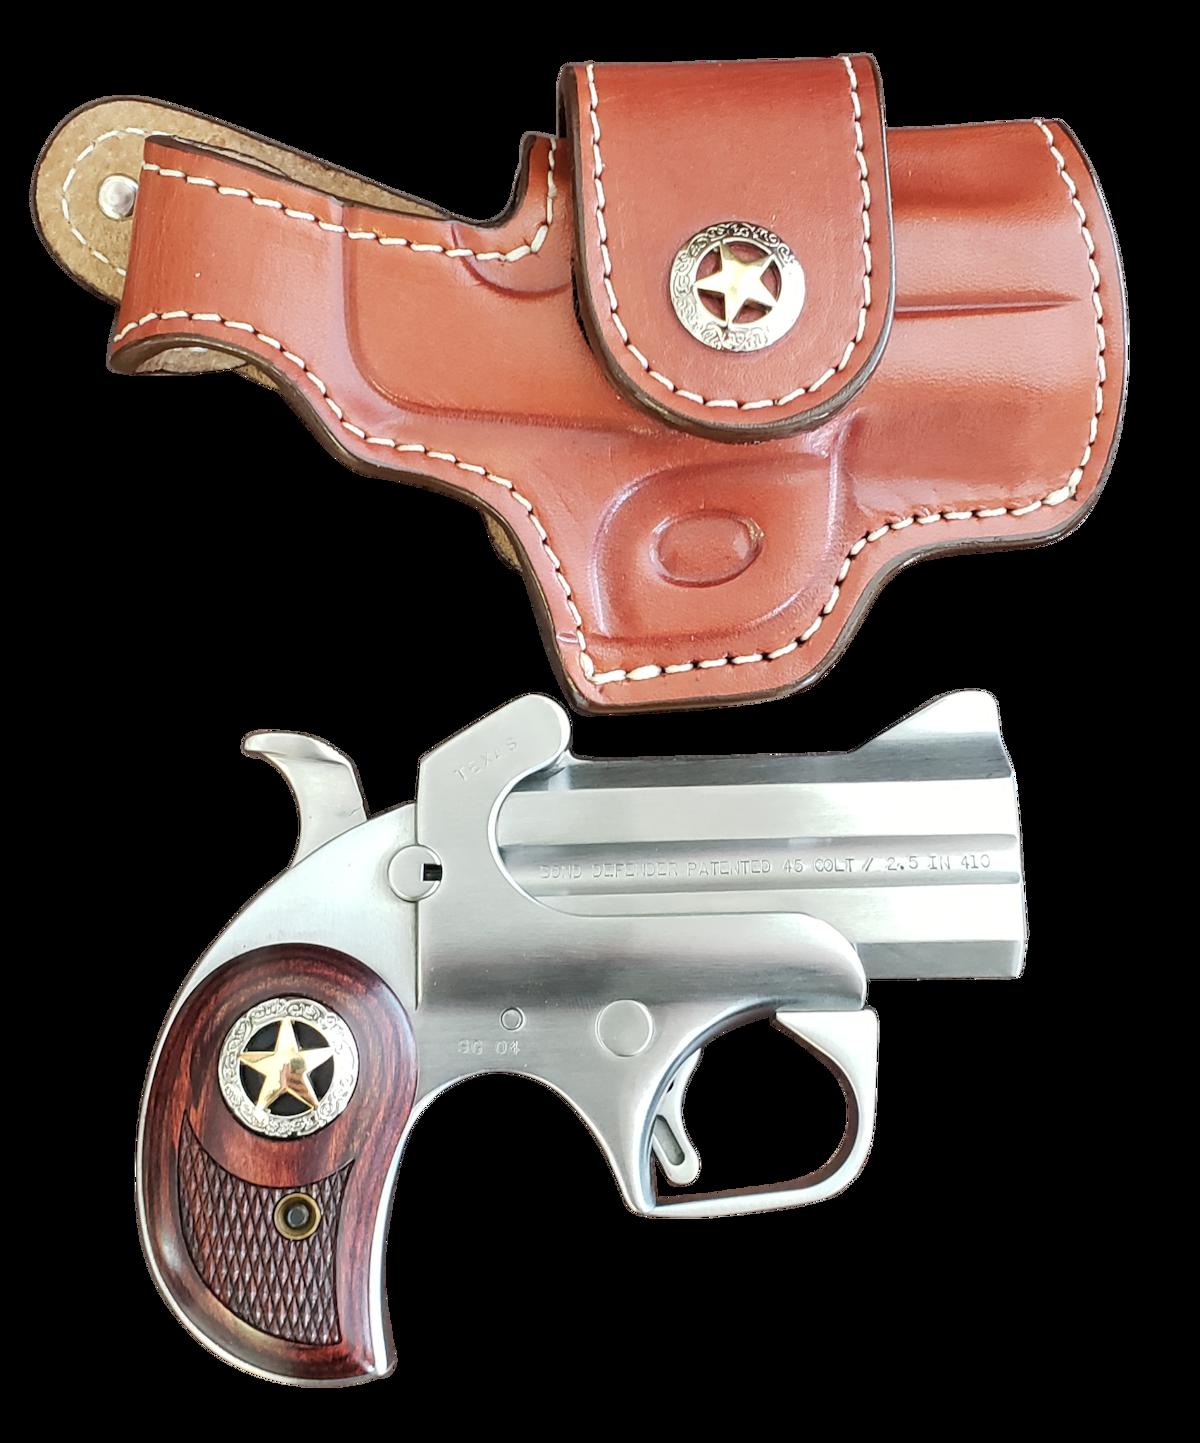 Bond Arms Rustic Defender